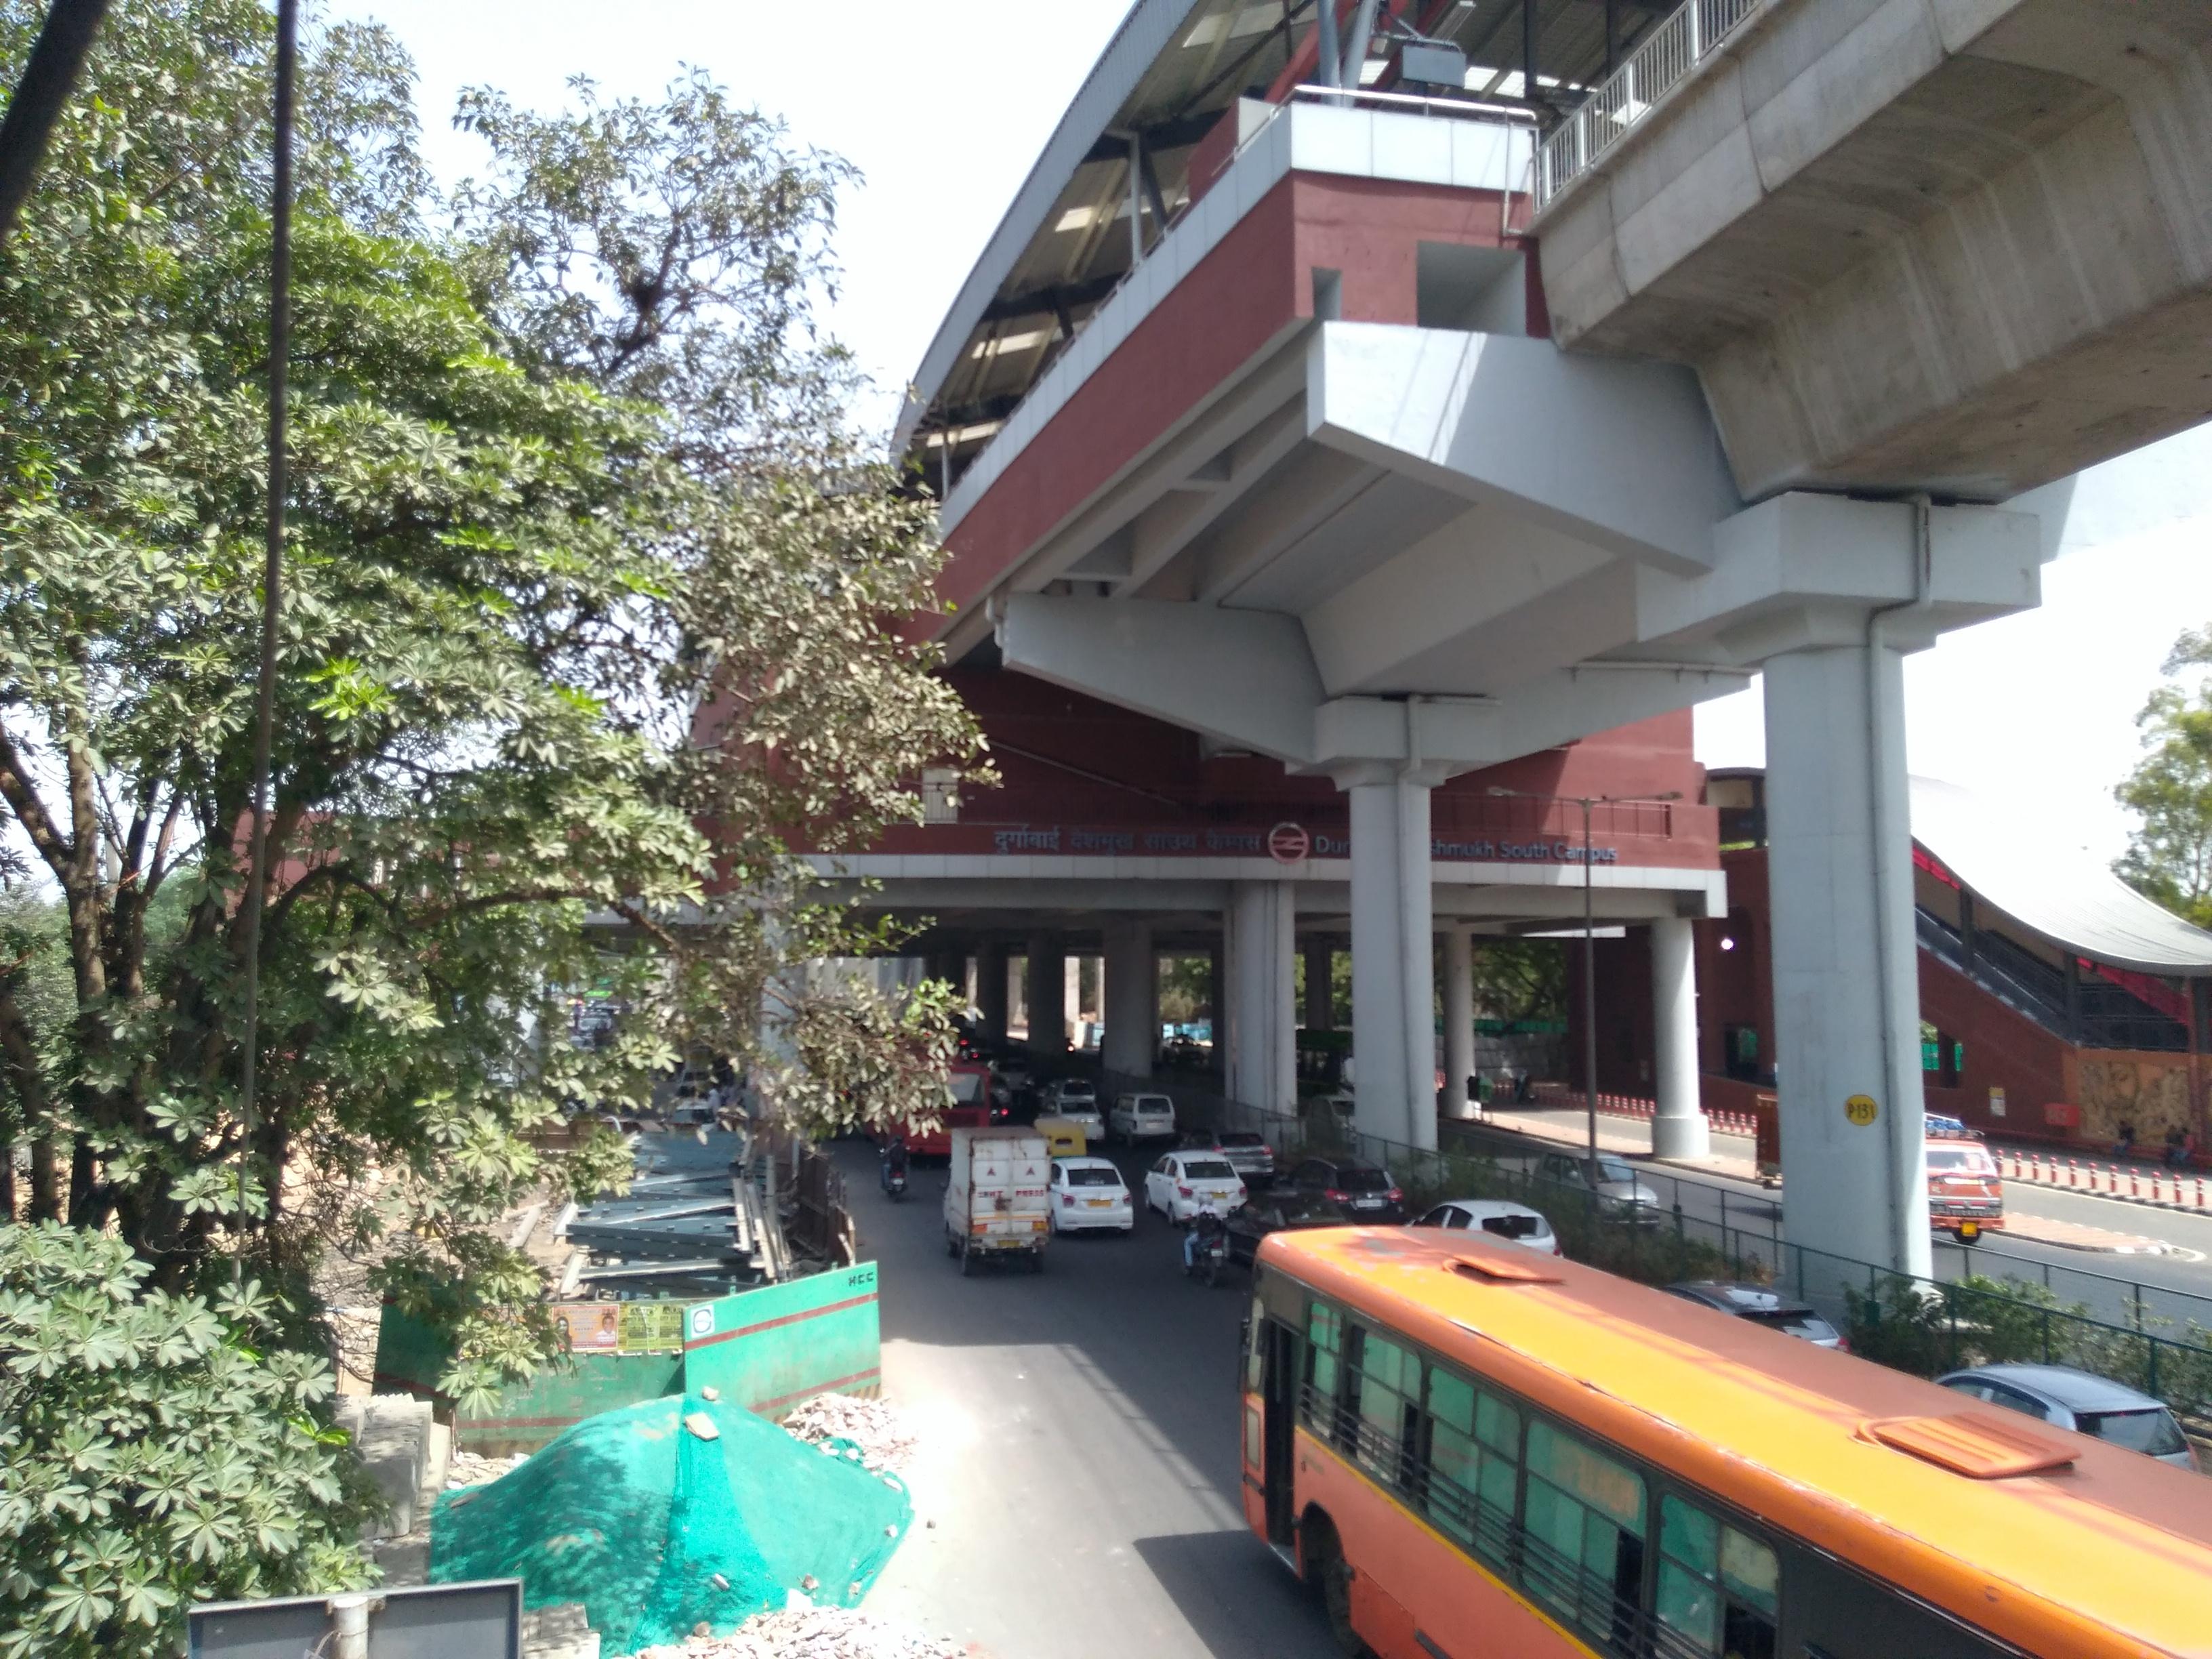 south campus tcc map Durgabai Deshmukh South Campus Metro Station Wikipedia south campus tcc map